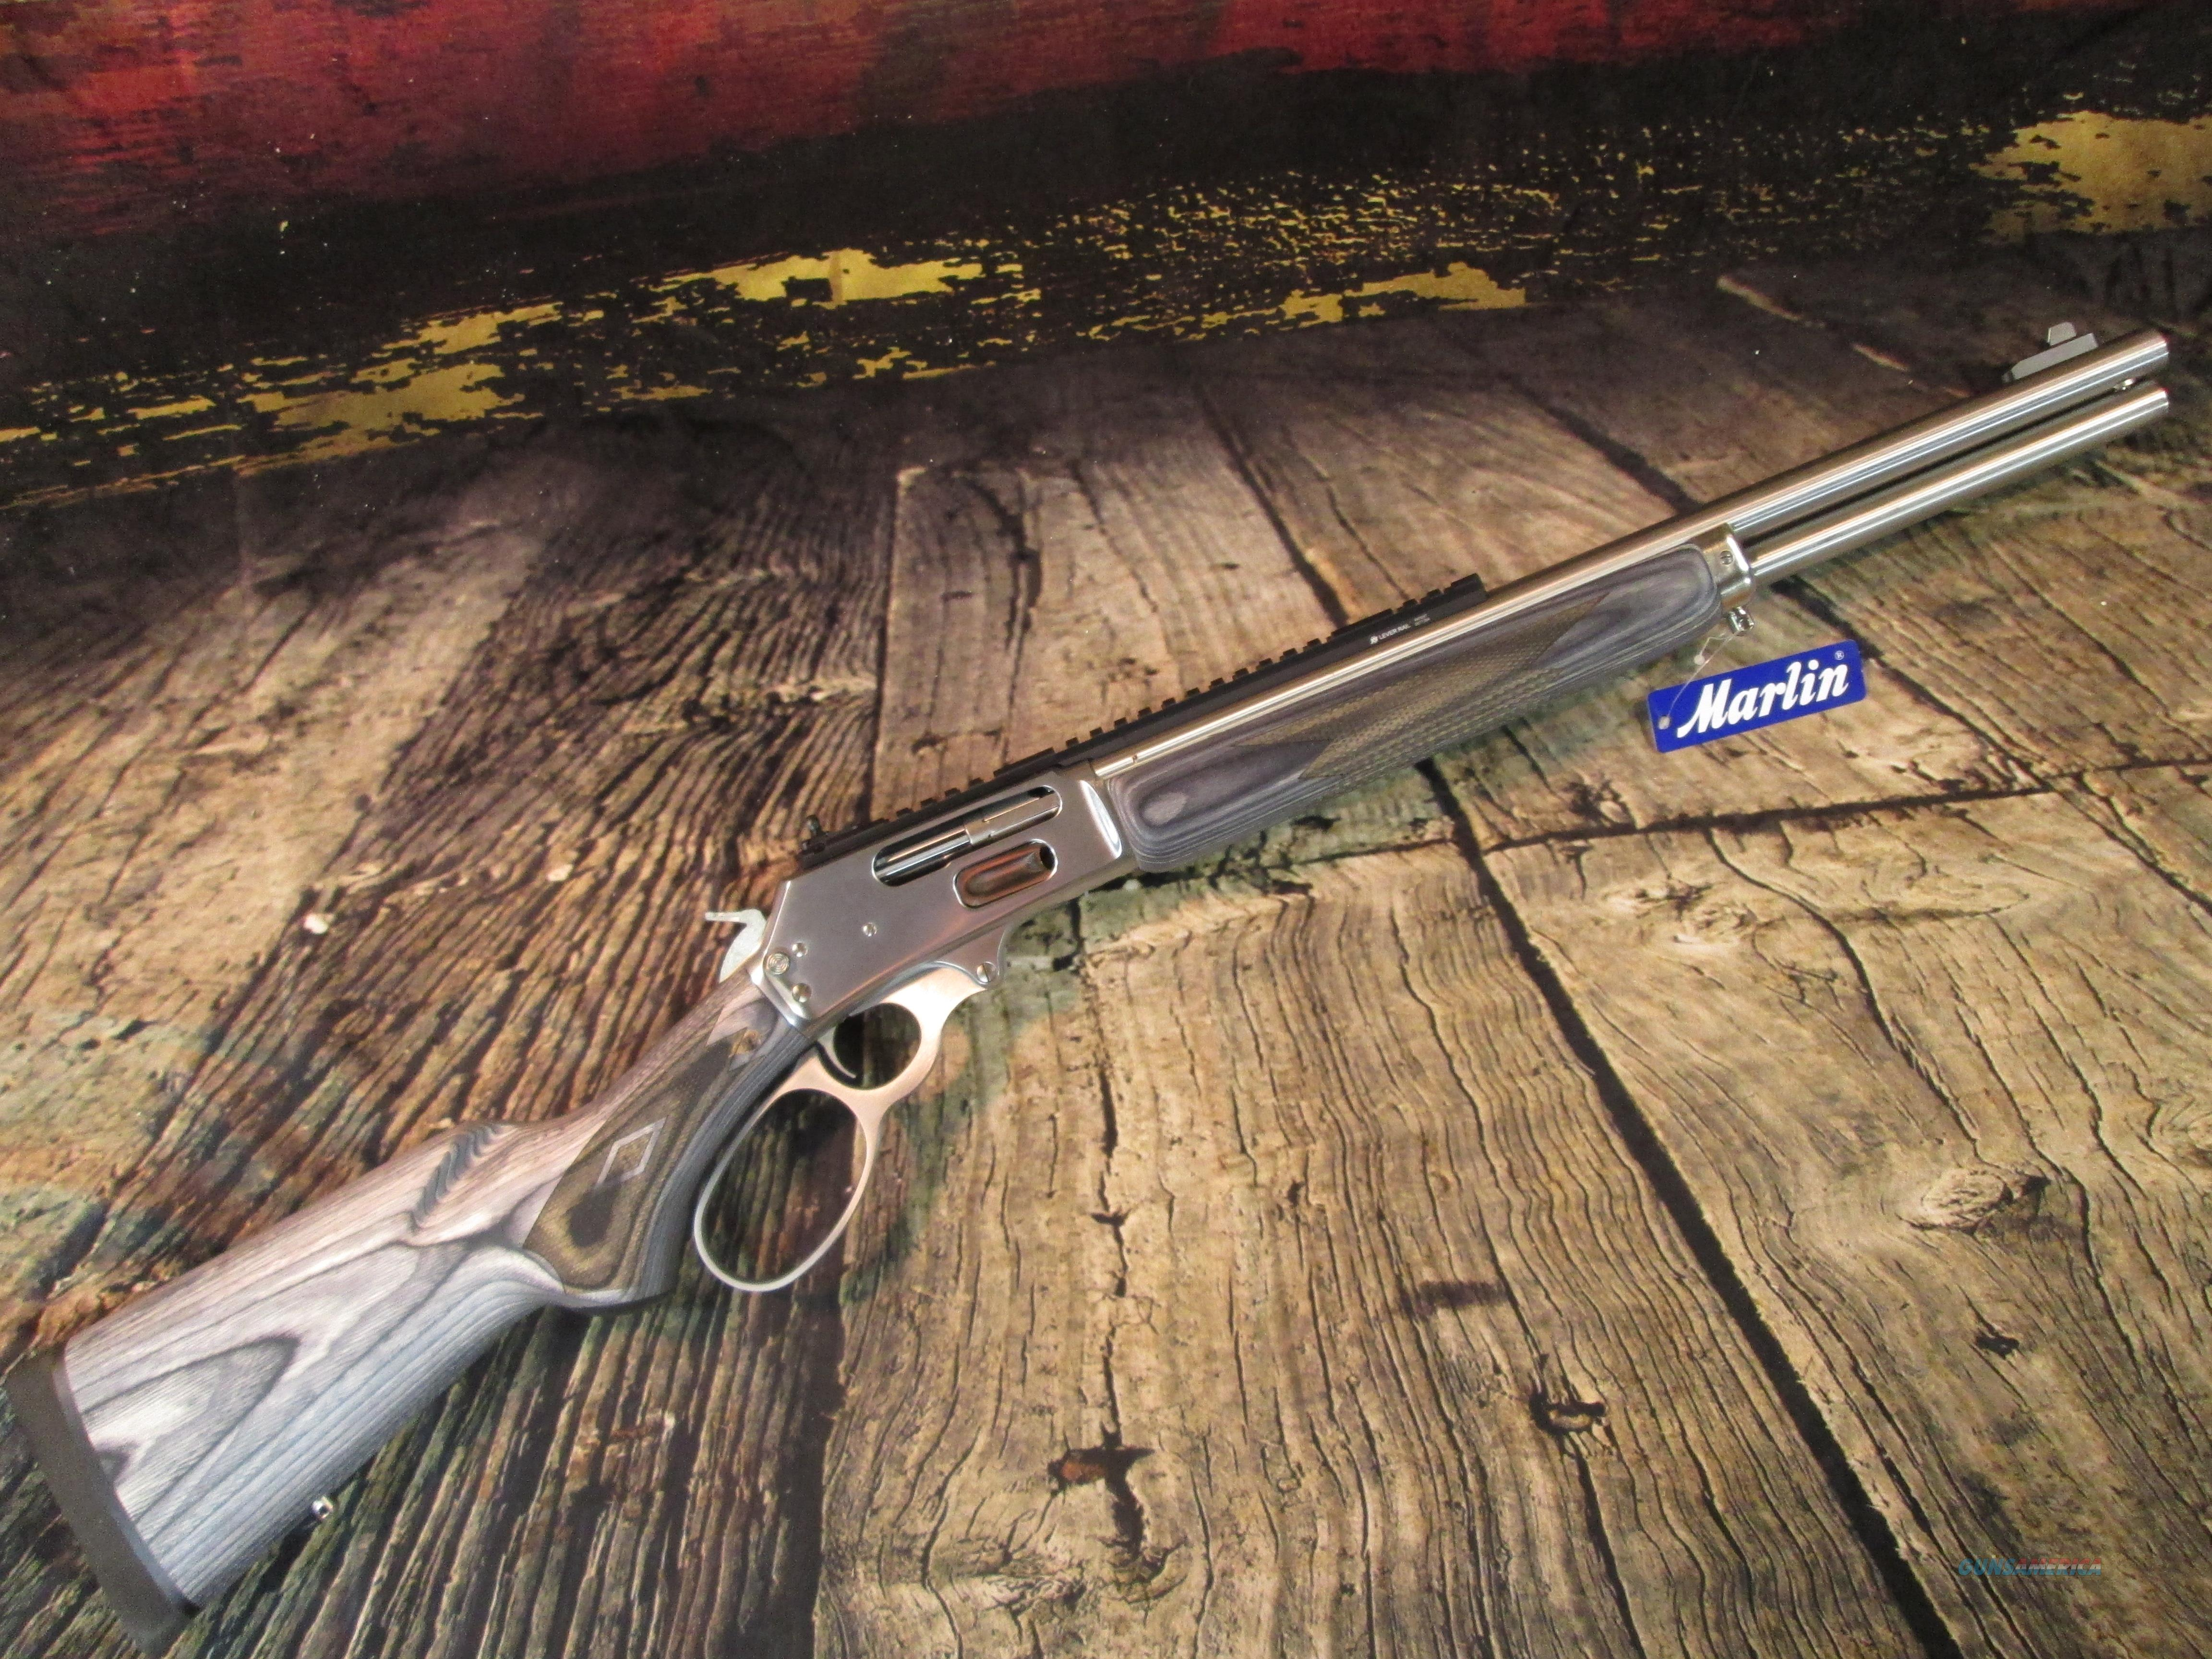 MARLIN 1895 SBL STAINLESS BIG LOOP 45/70 NEW (70478)  Guns > Rifles > Marlin Rifles > Modern > Lever Action